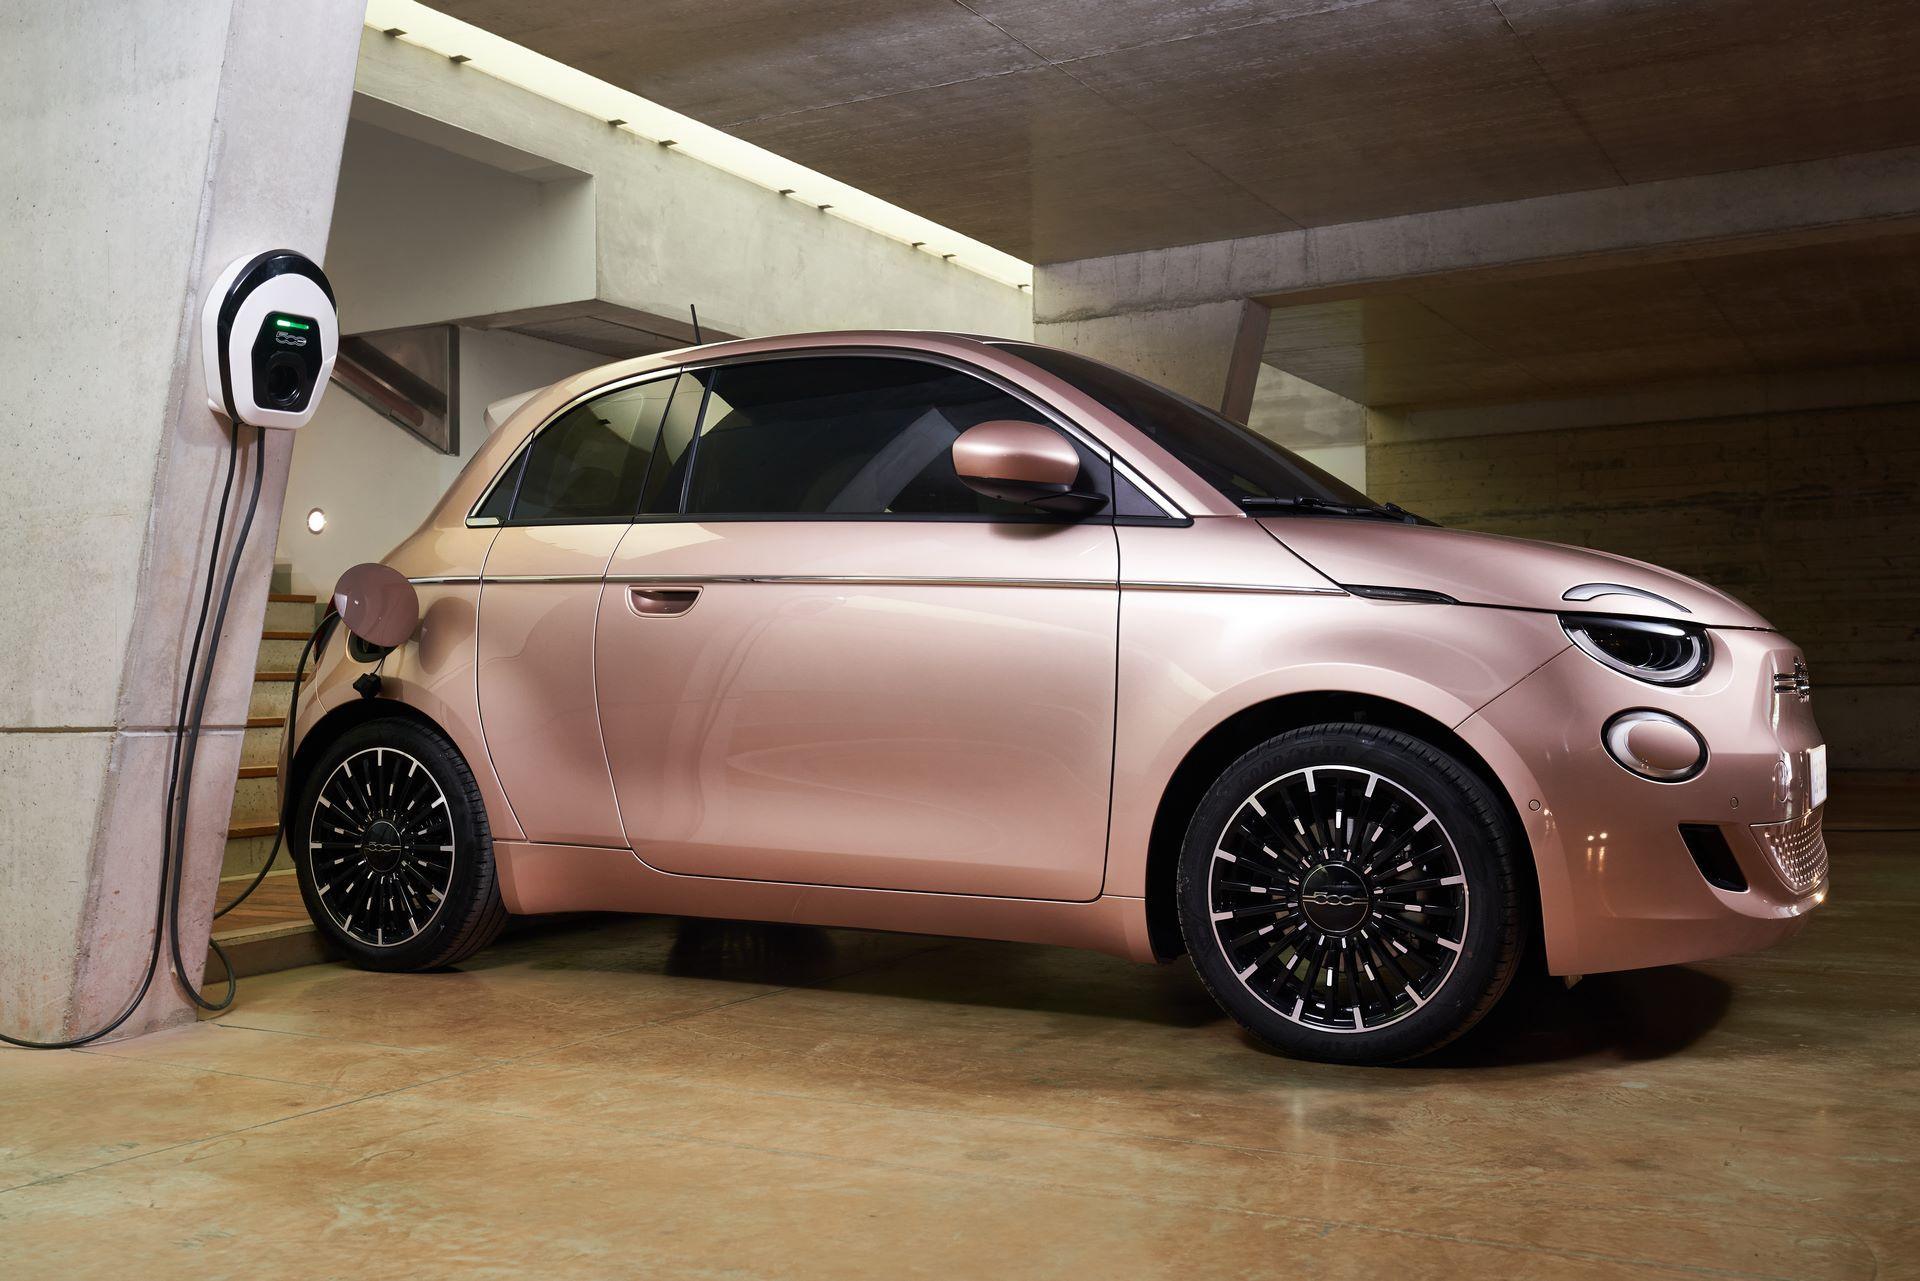 Fiat-500-Electric-31-28